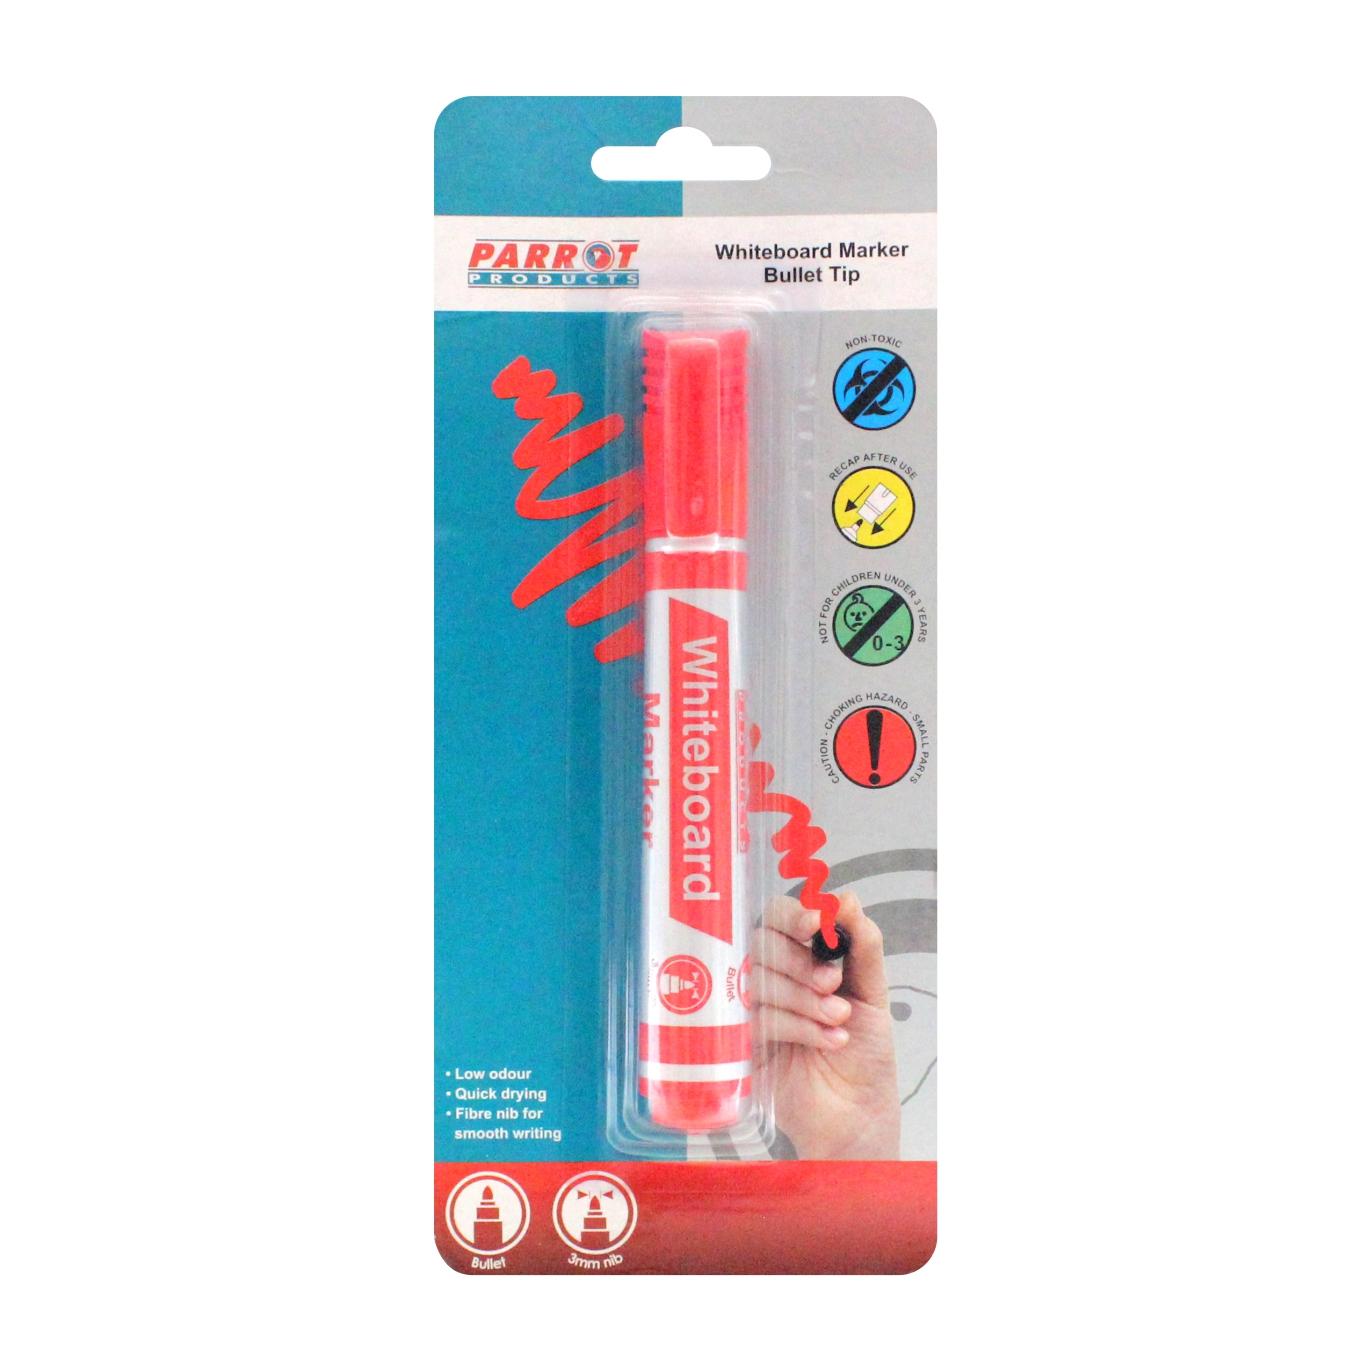 Whiteboard Marker (Bullet Tip - Carded - Red)